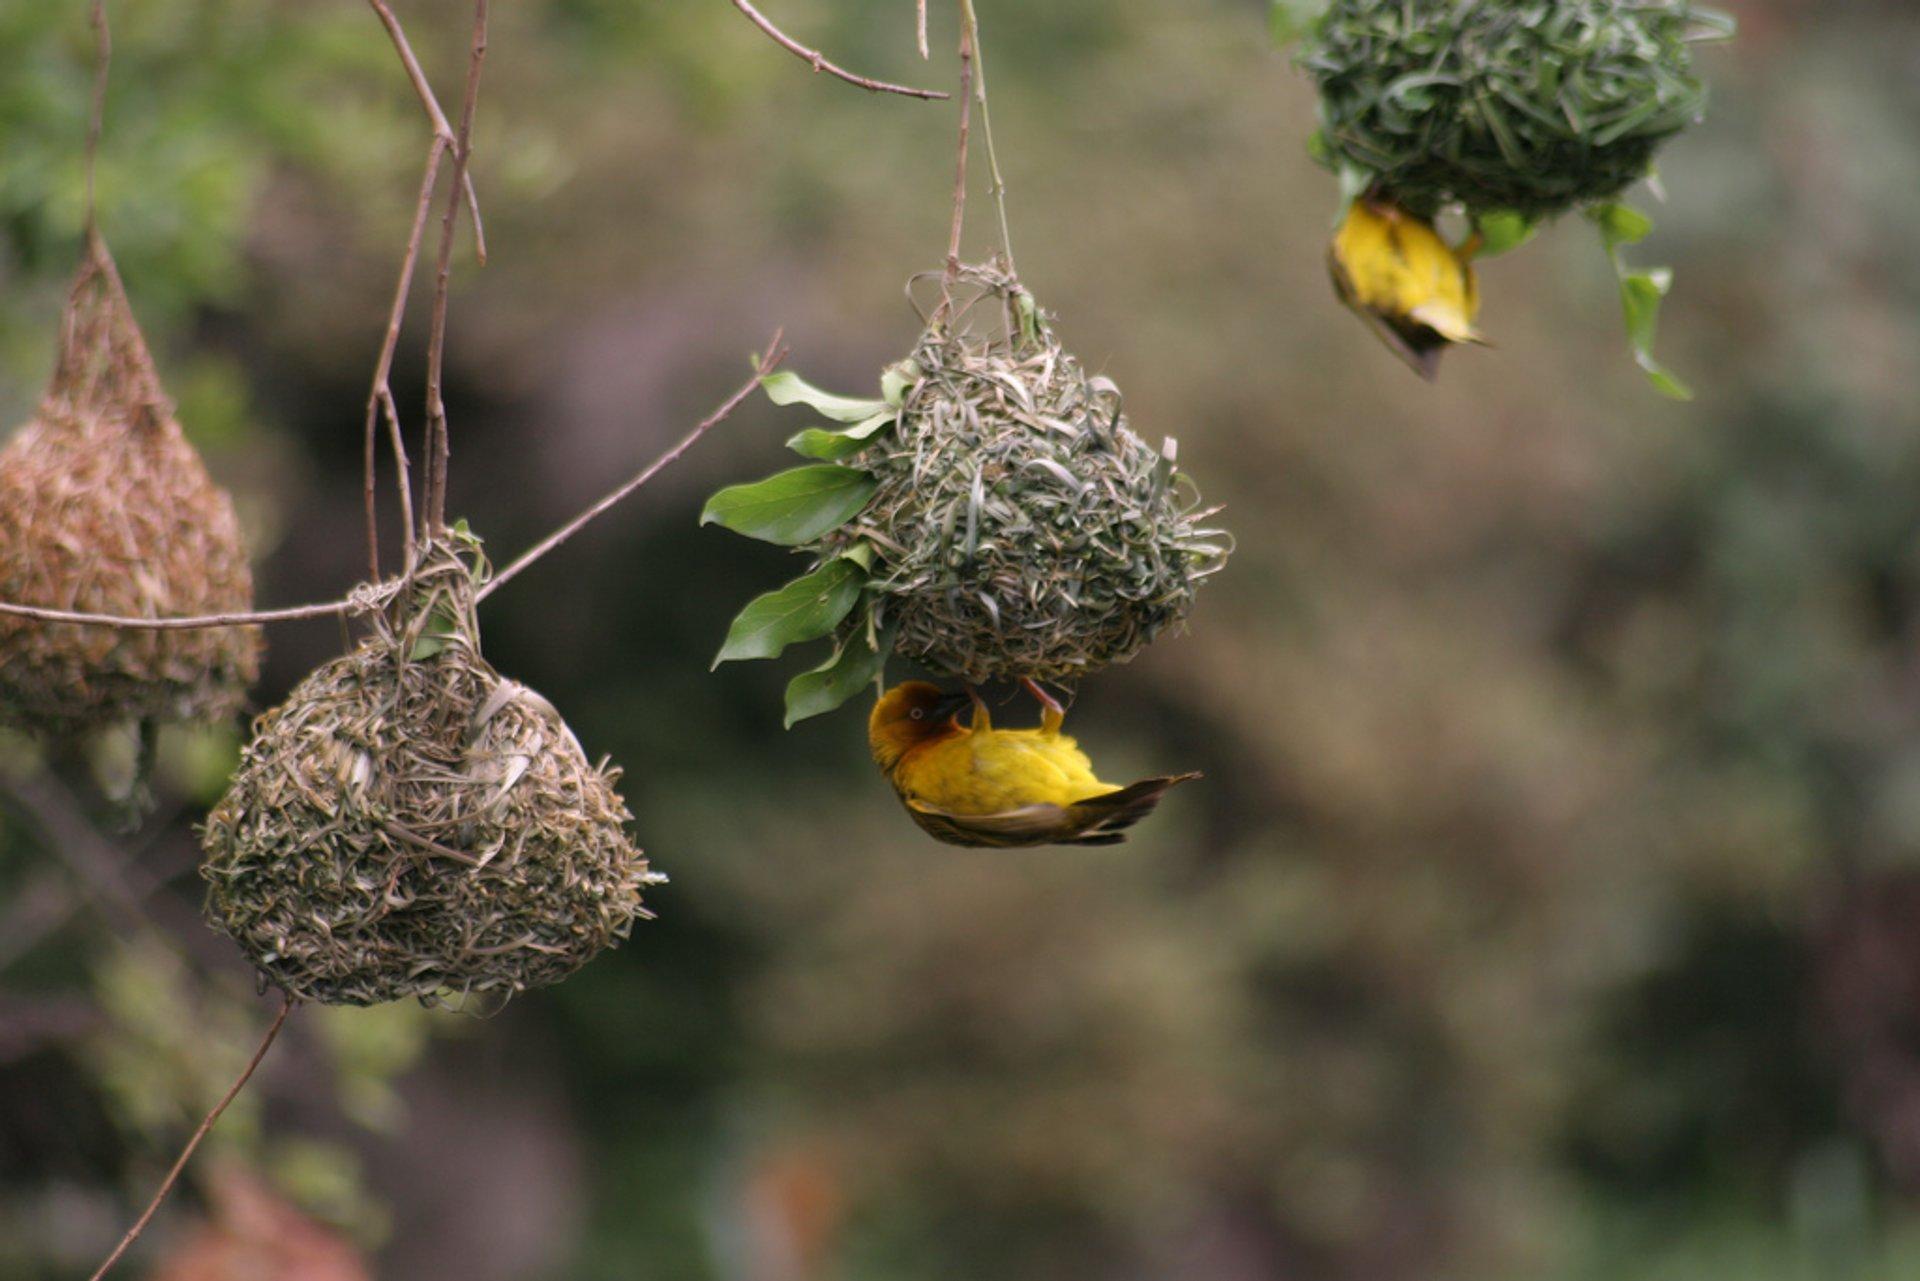 Cape weaver in breeding plumage 2019